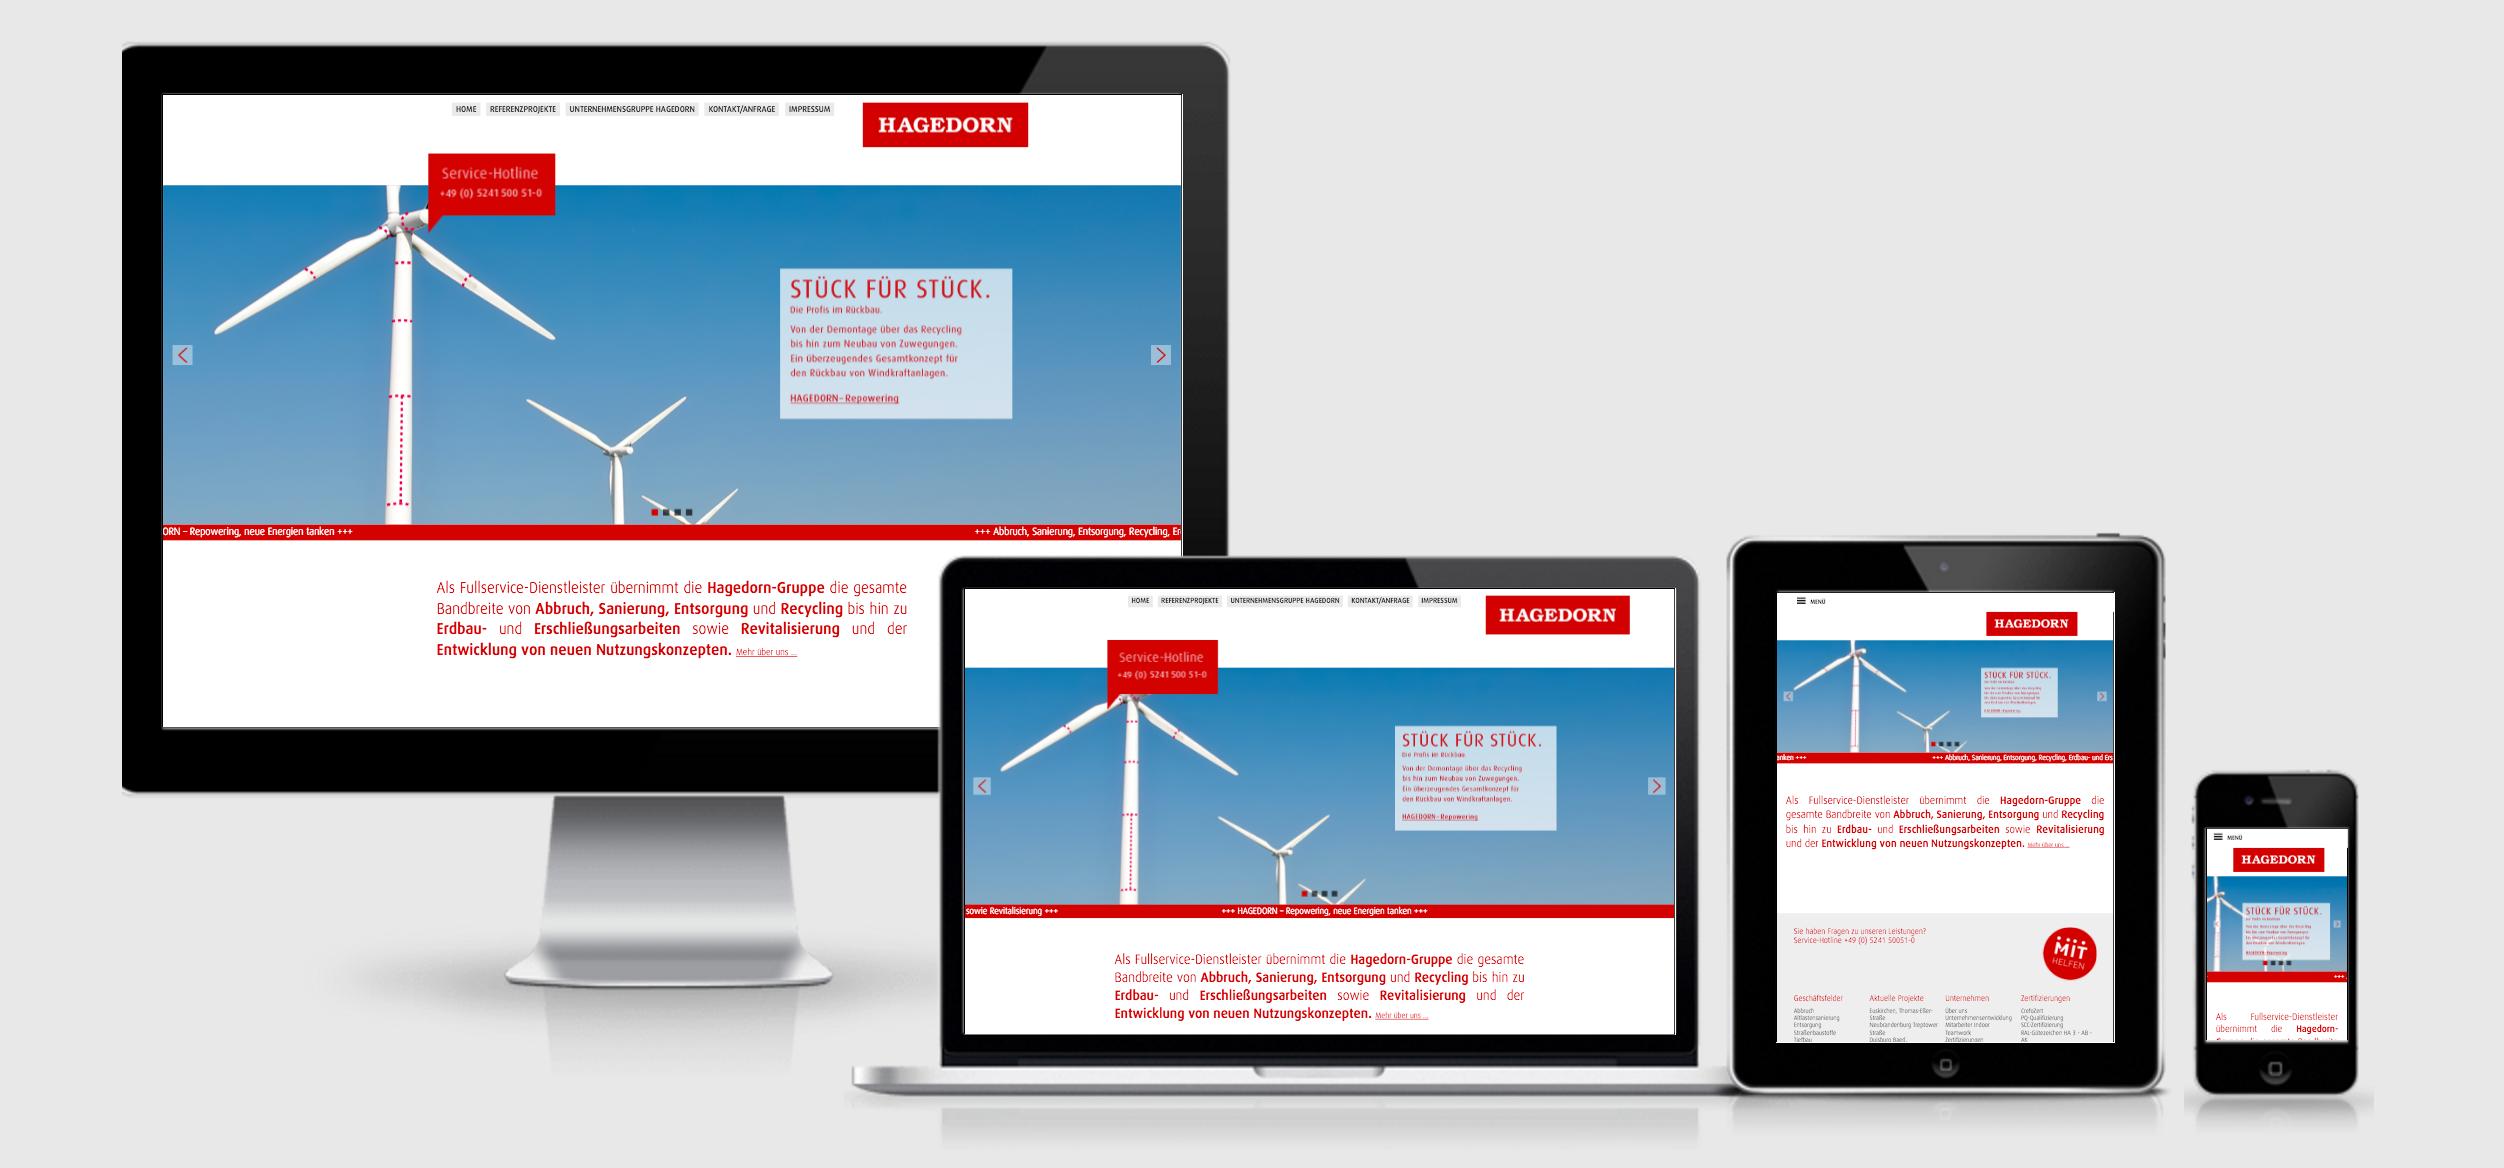 liquidinterface-eu_hagedorn-repowering-com_corporate